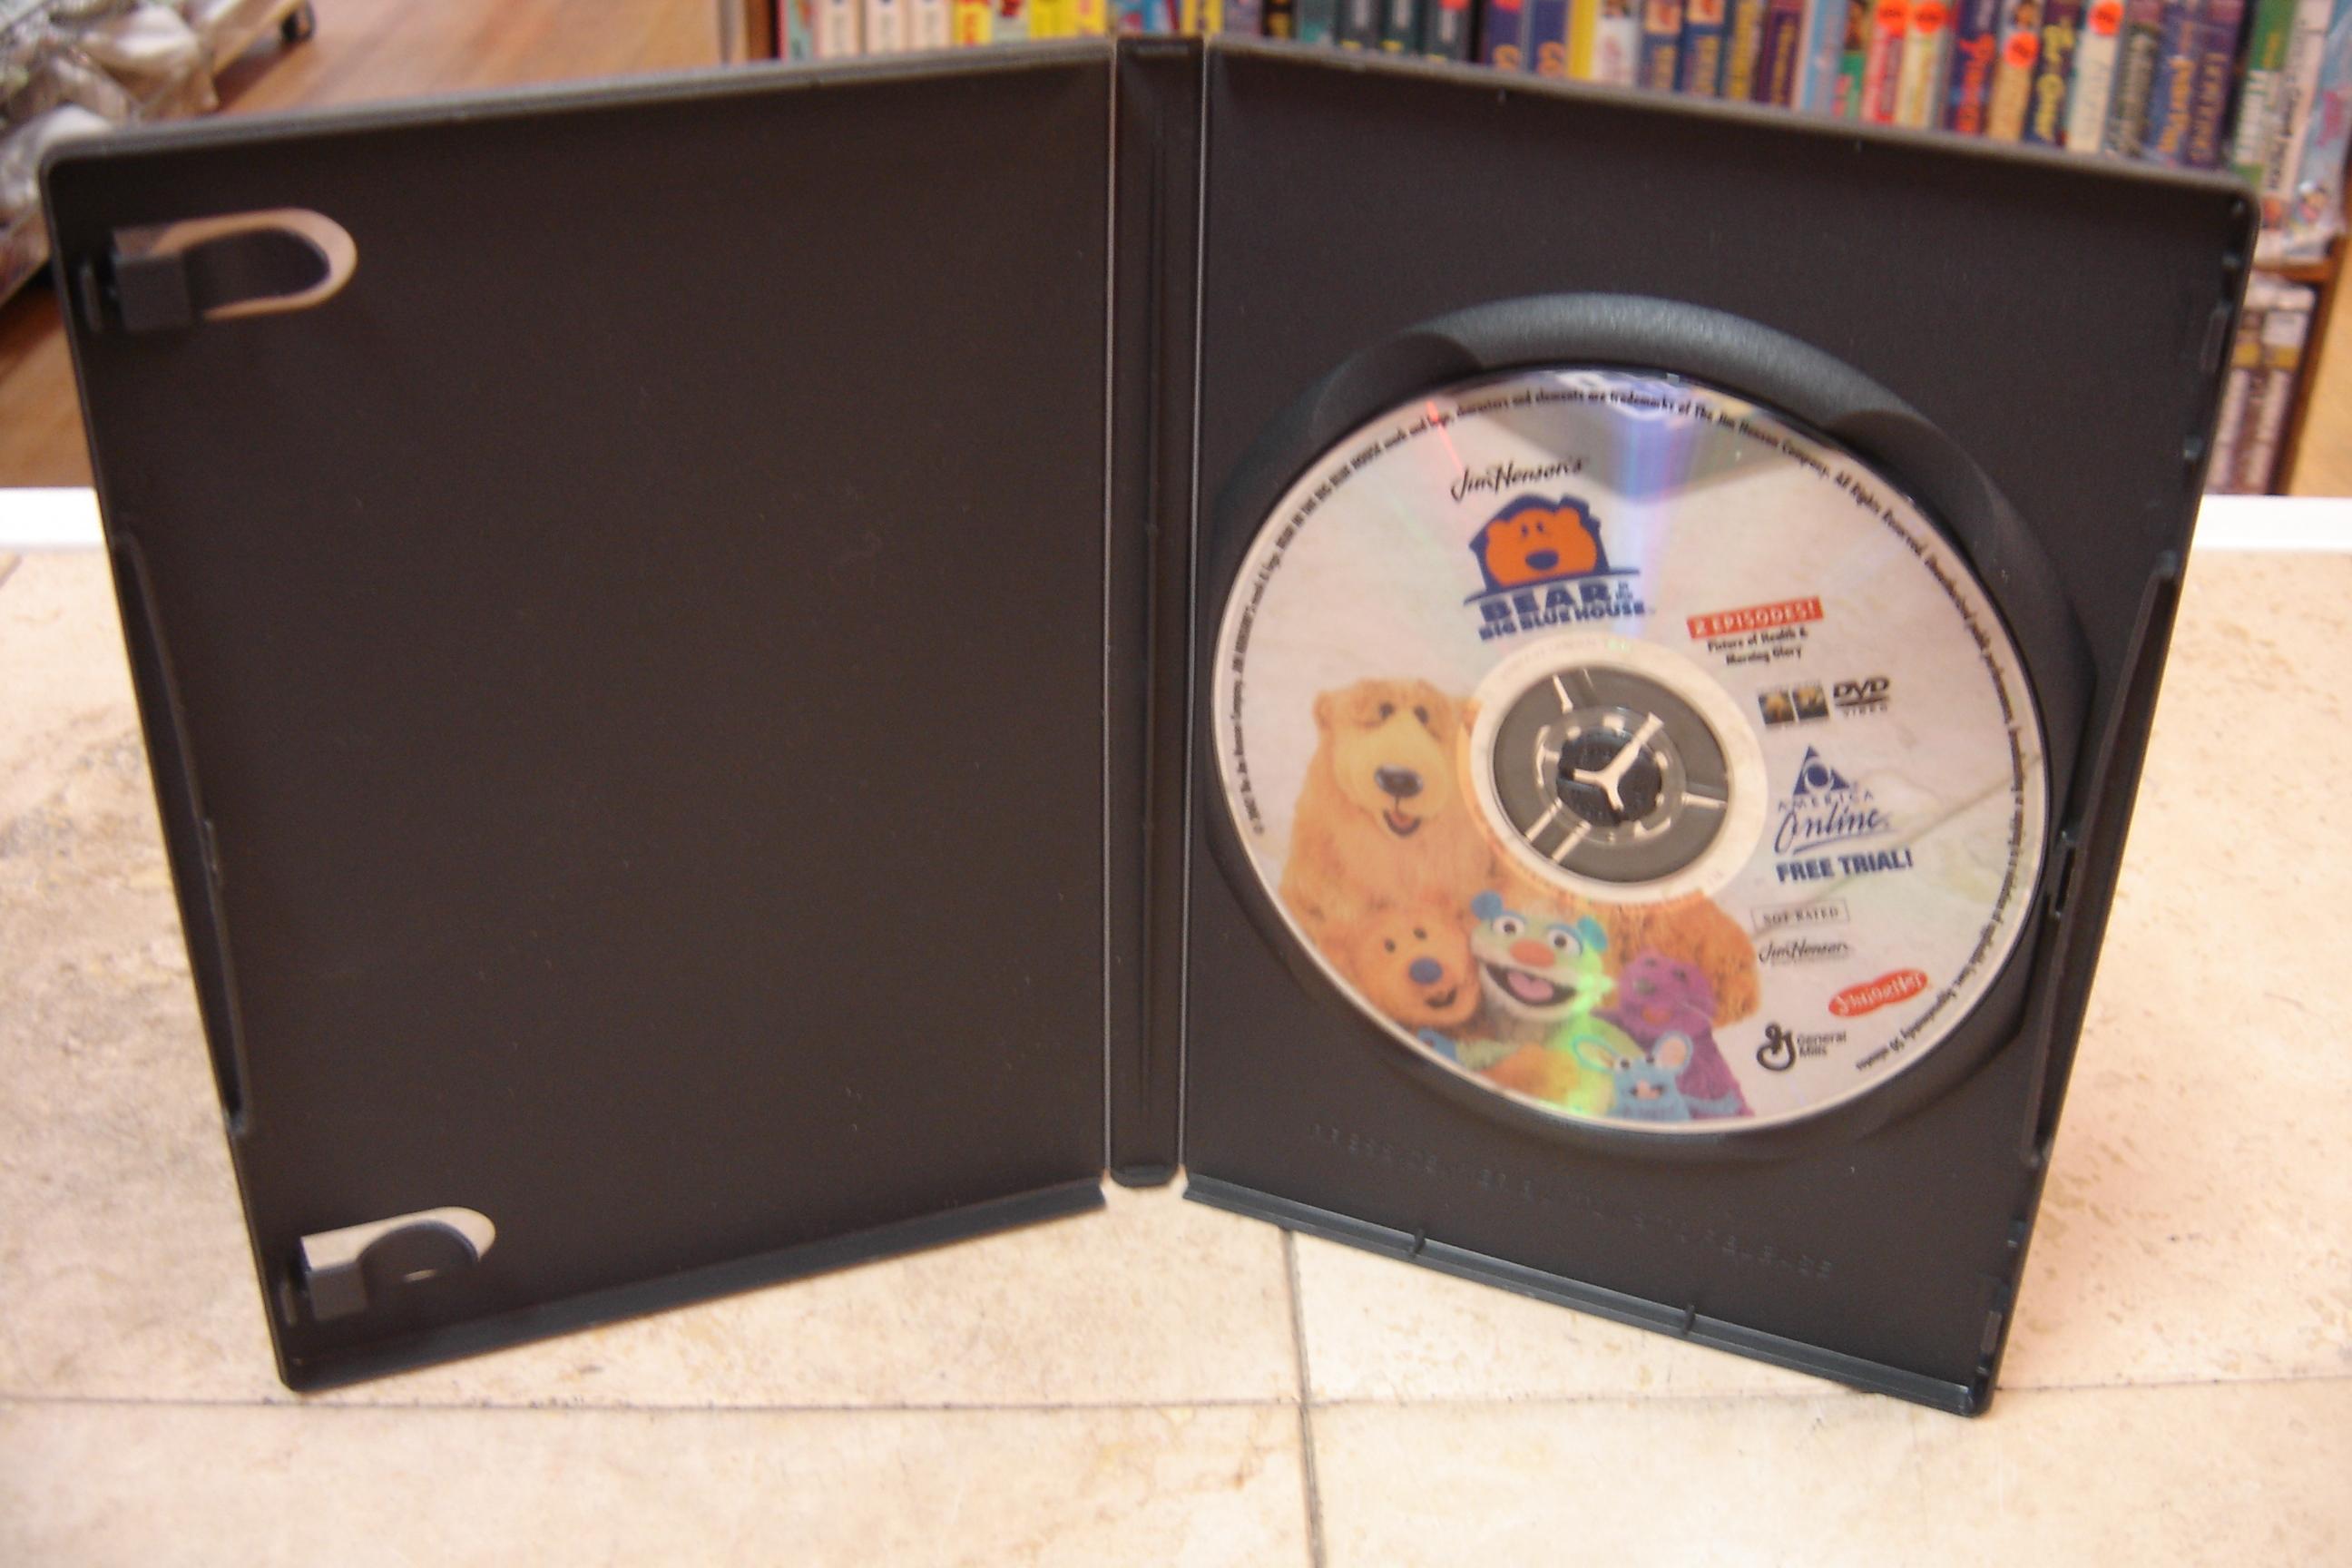 Disneys-Bear-in-the-Big-Blue-House-DVD_189605A.jpg